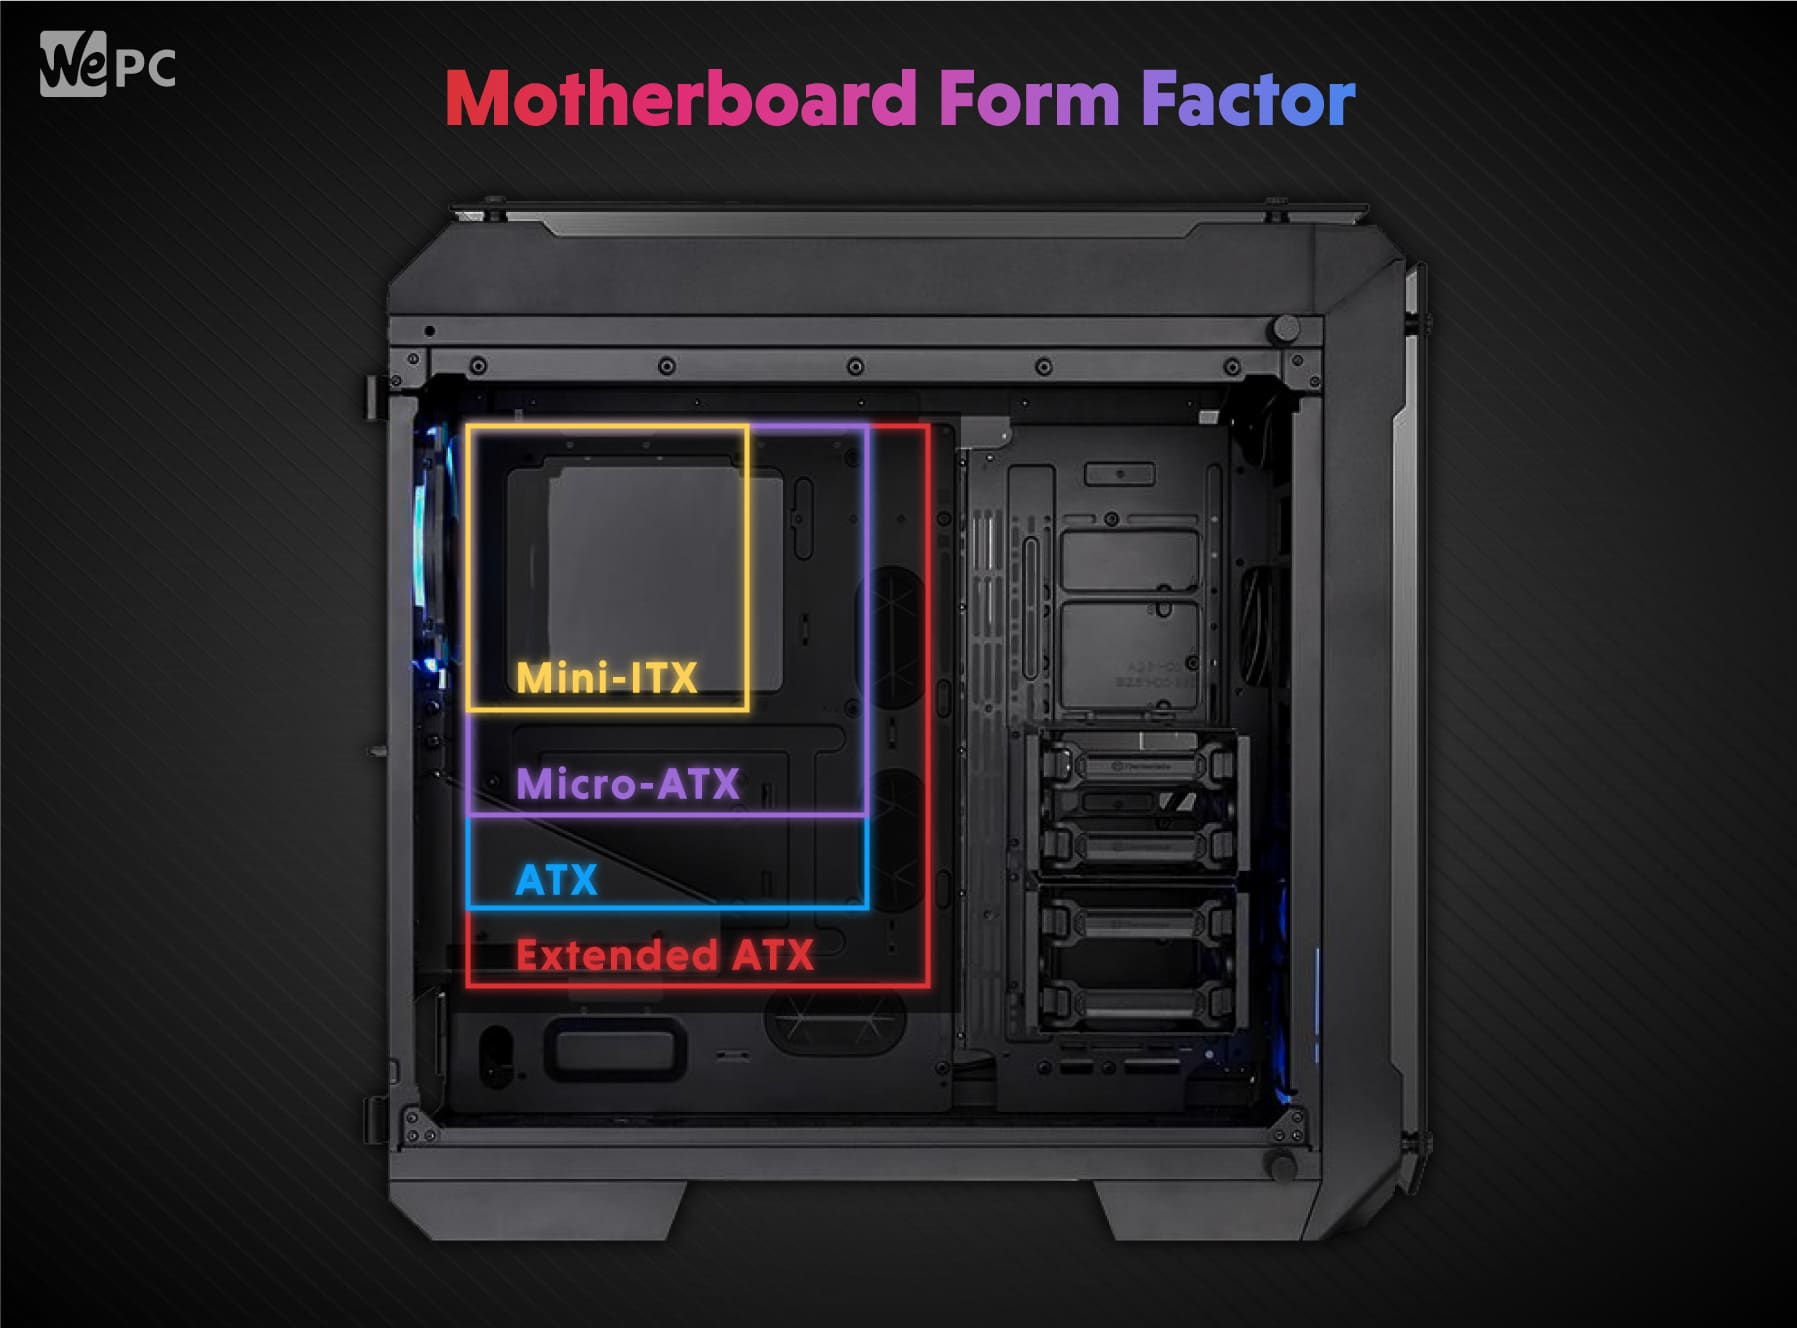 Motherboard form factor